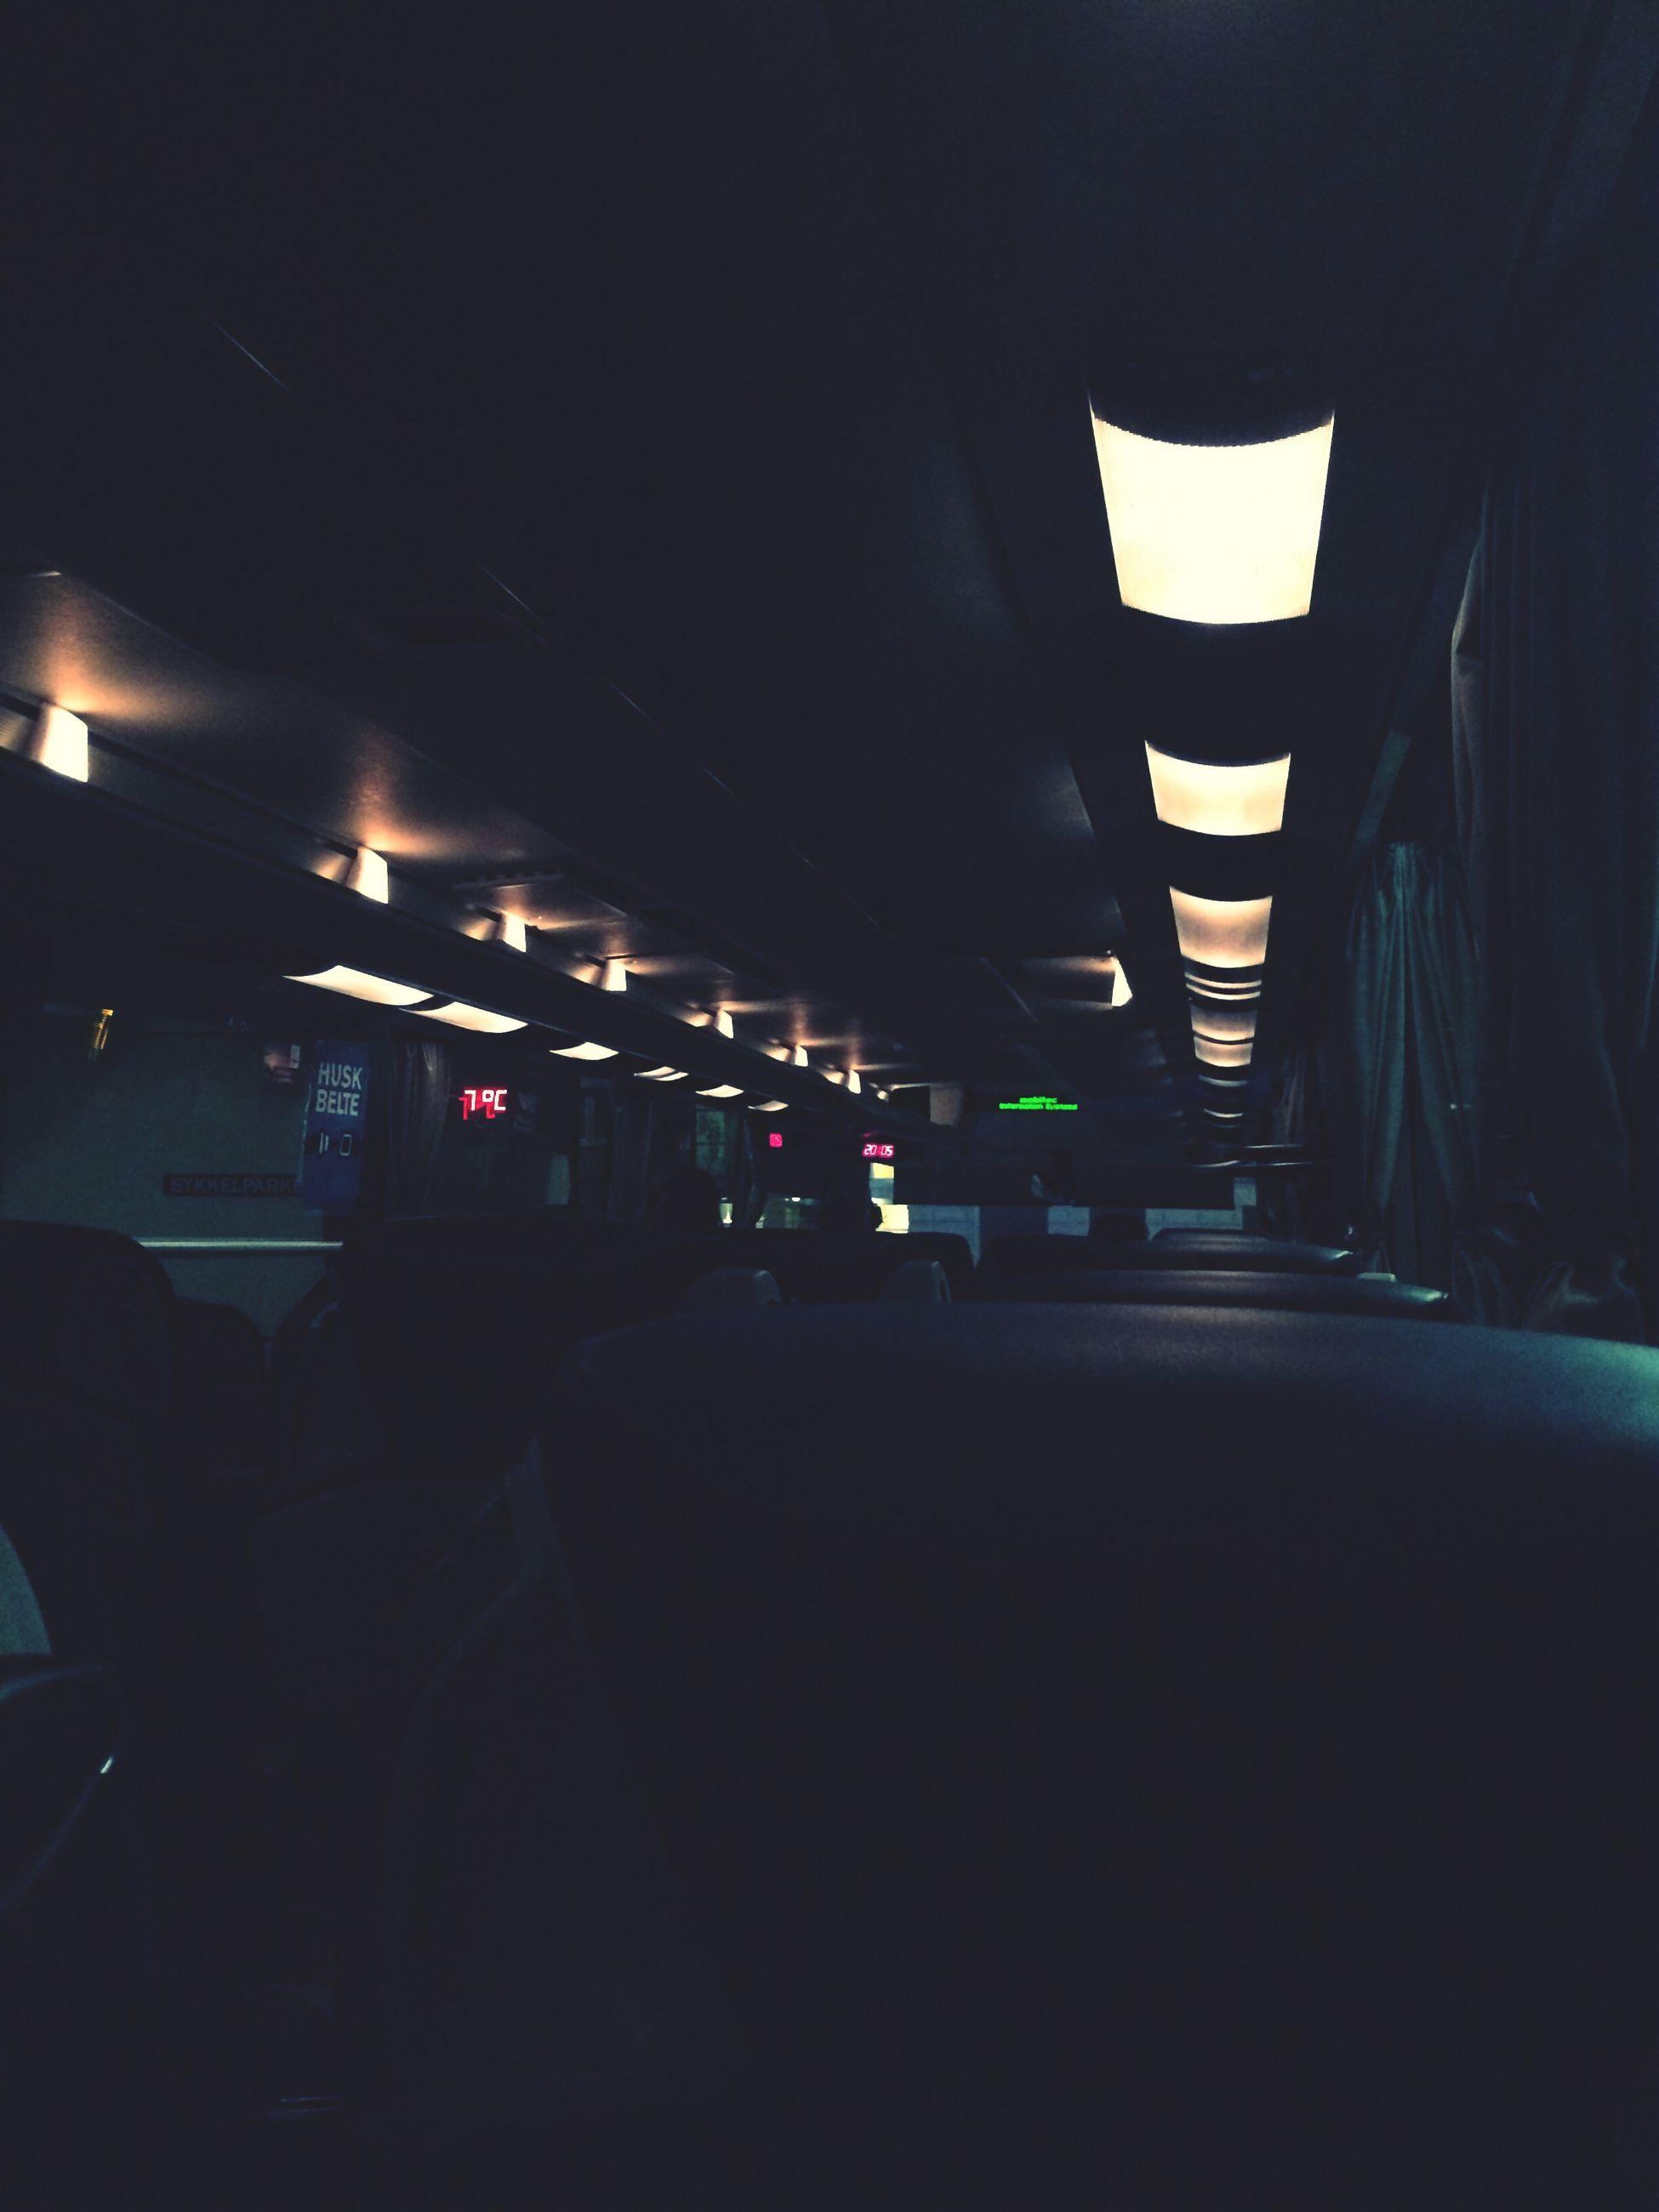 illuminated, night, transportation, lighting equipment, architecture, built structure, dark, indoors, mode of transport, the way forward, empty, street, absence, light - natural phenomenon, building exterior, street light, land vehicle, road, city, incidental people